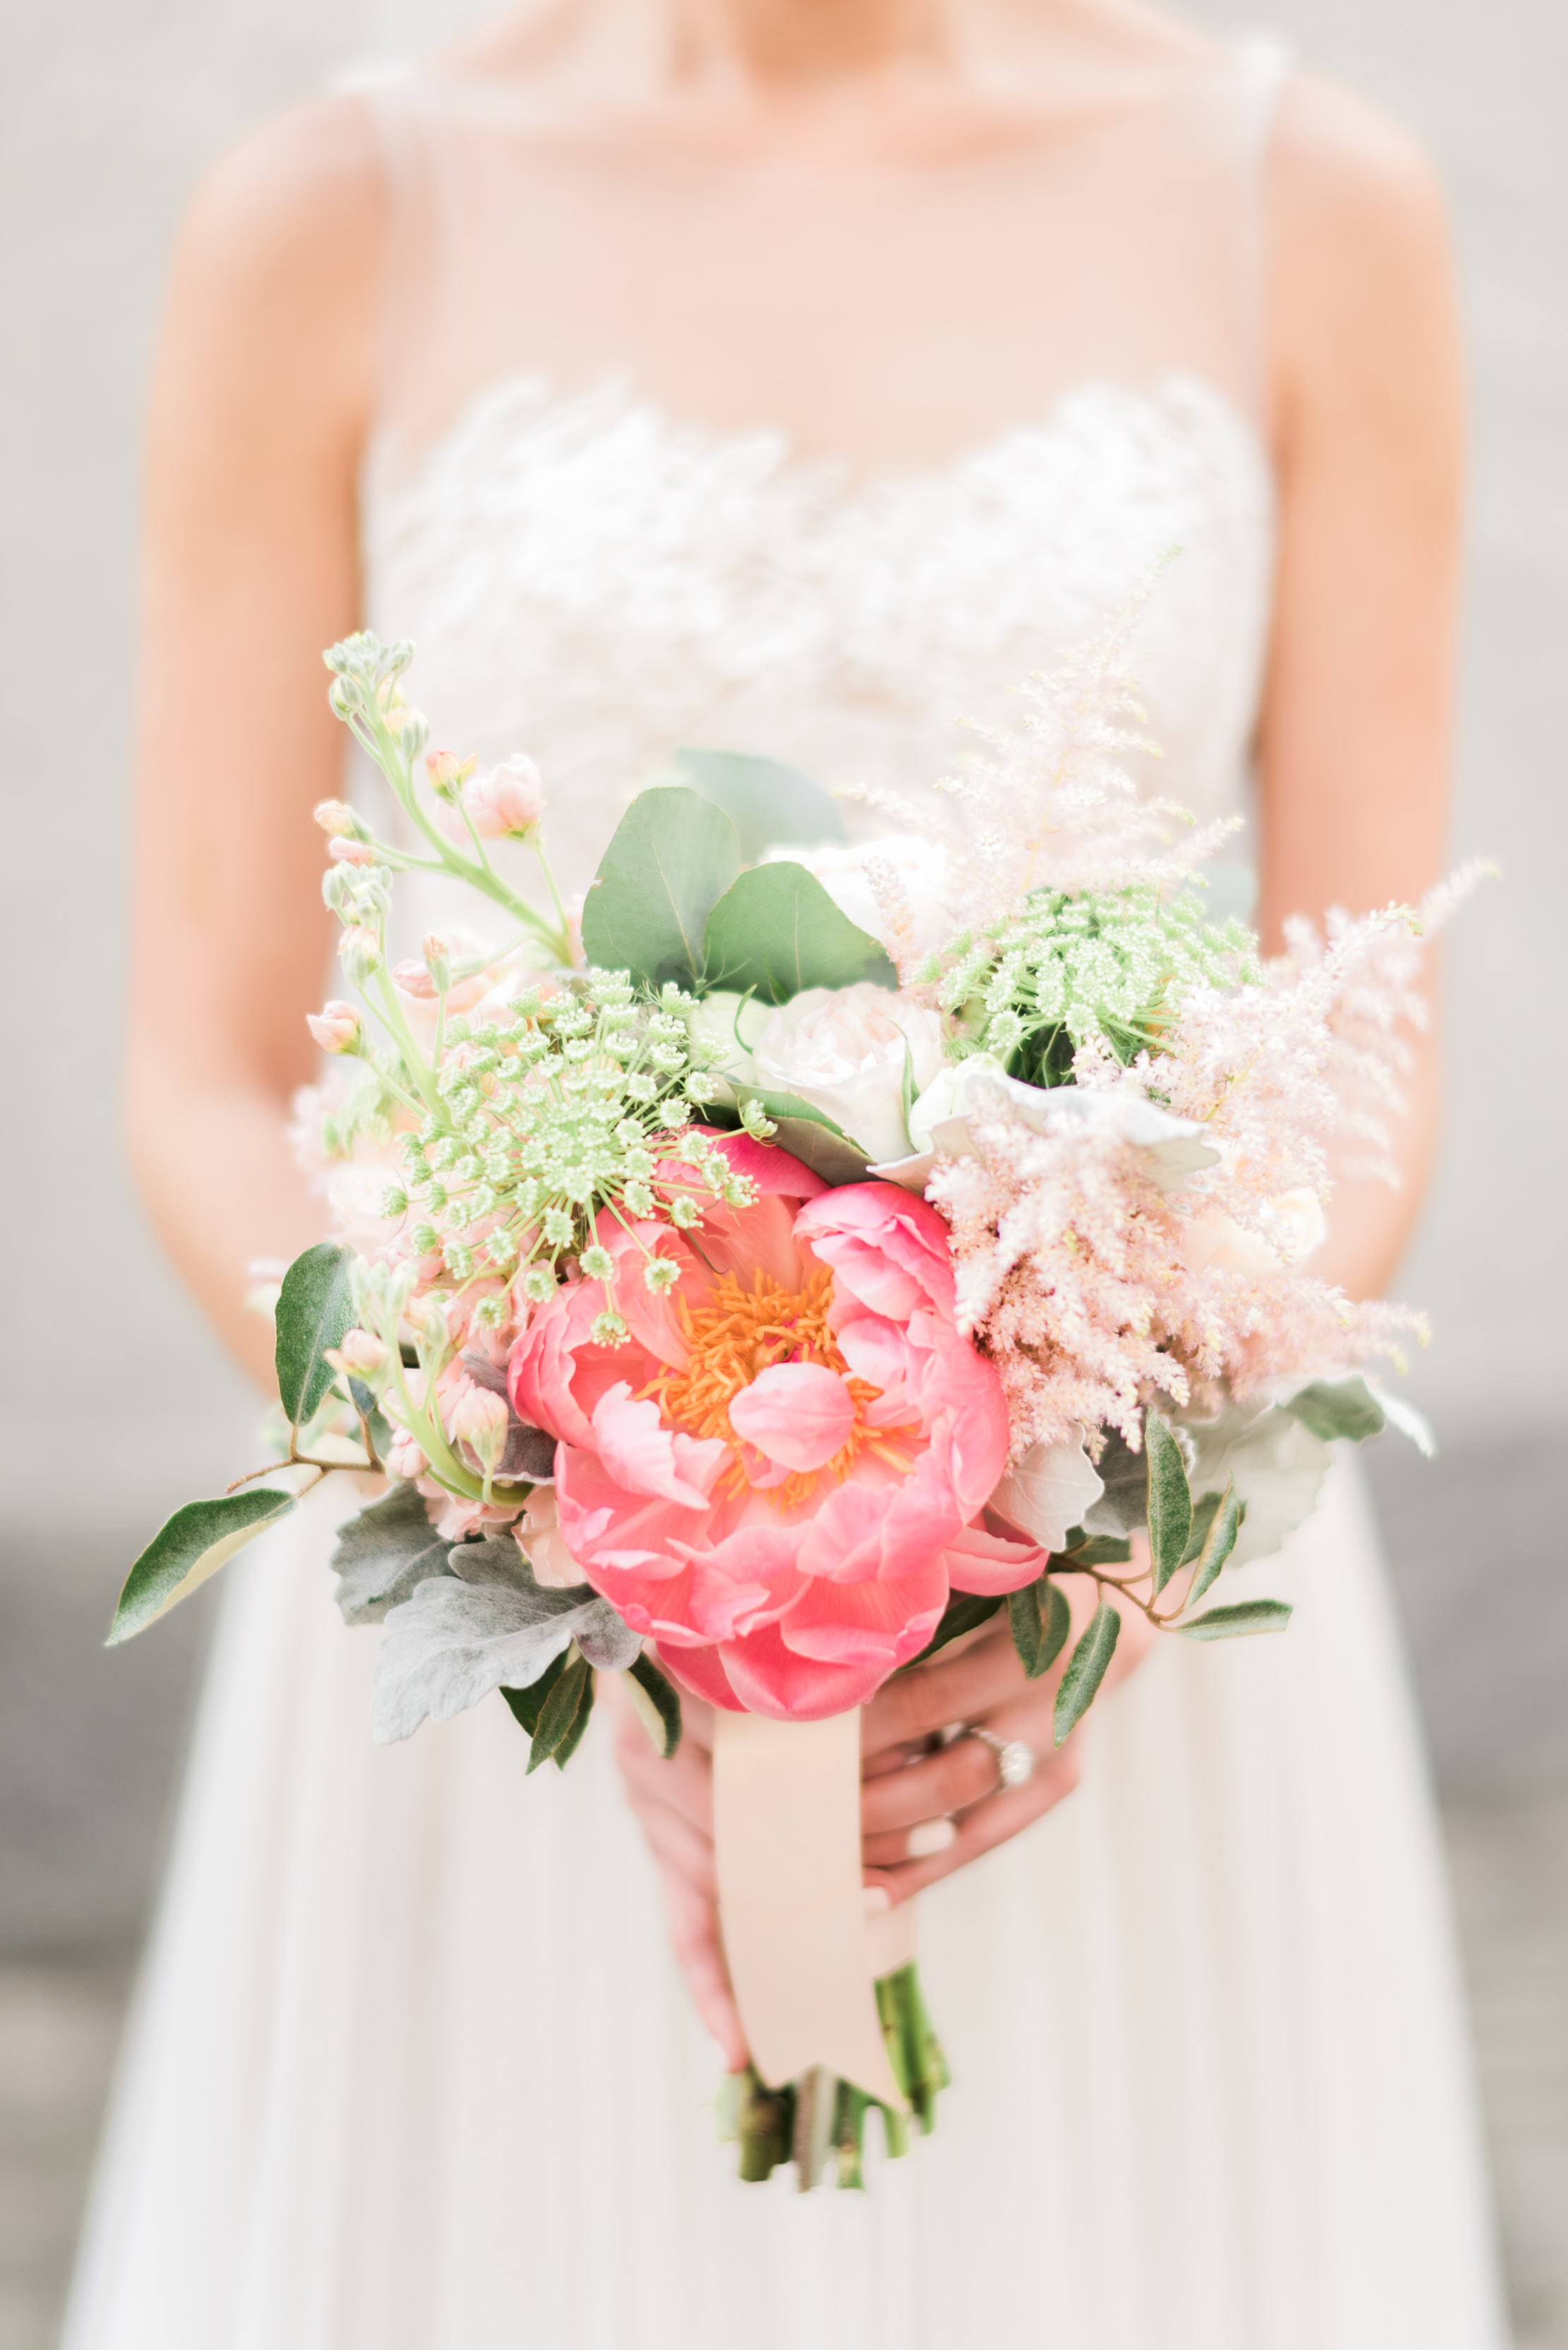 Downtown Raleigh Wedding, Bridal Bouquet